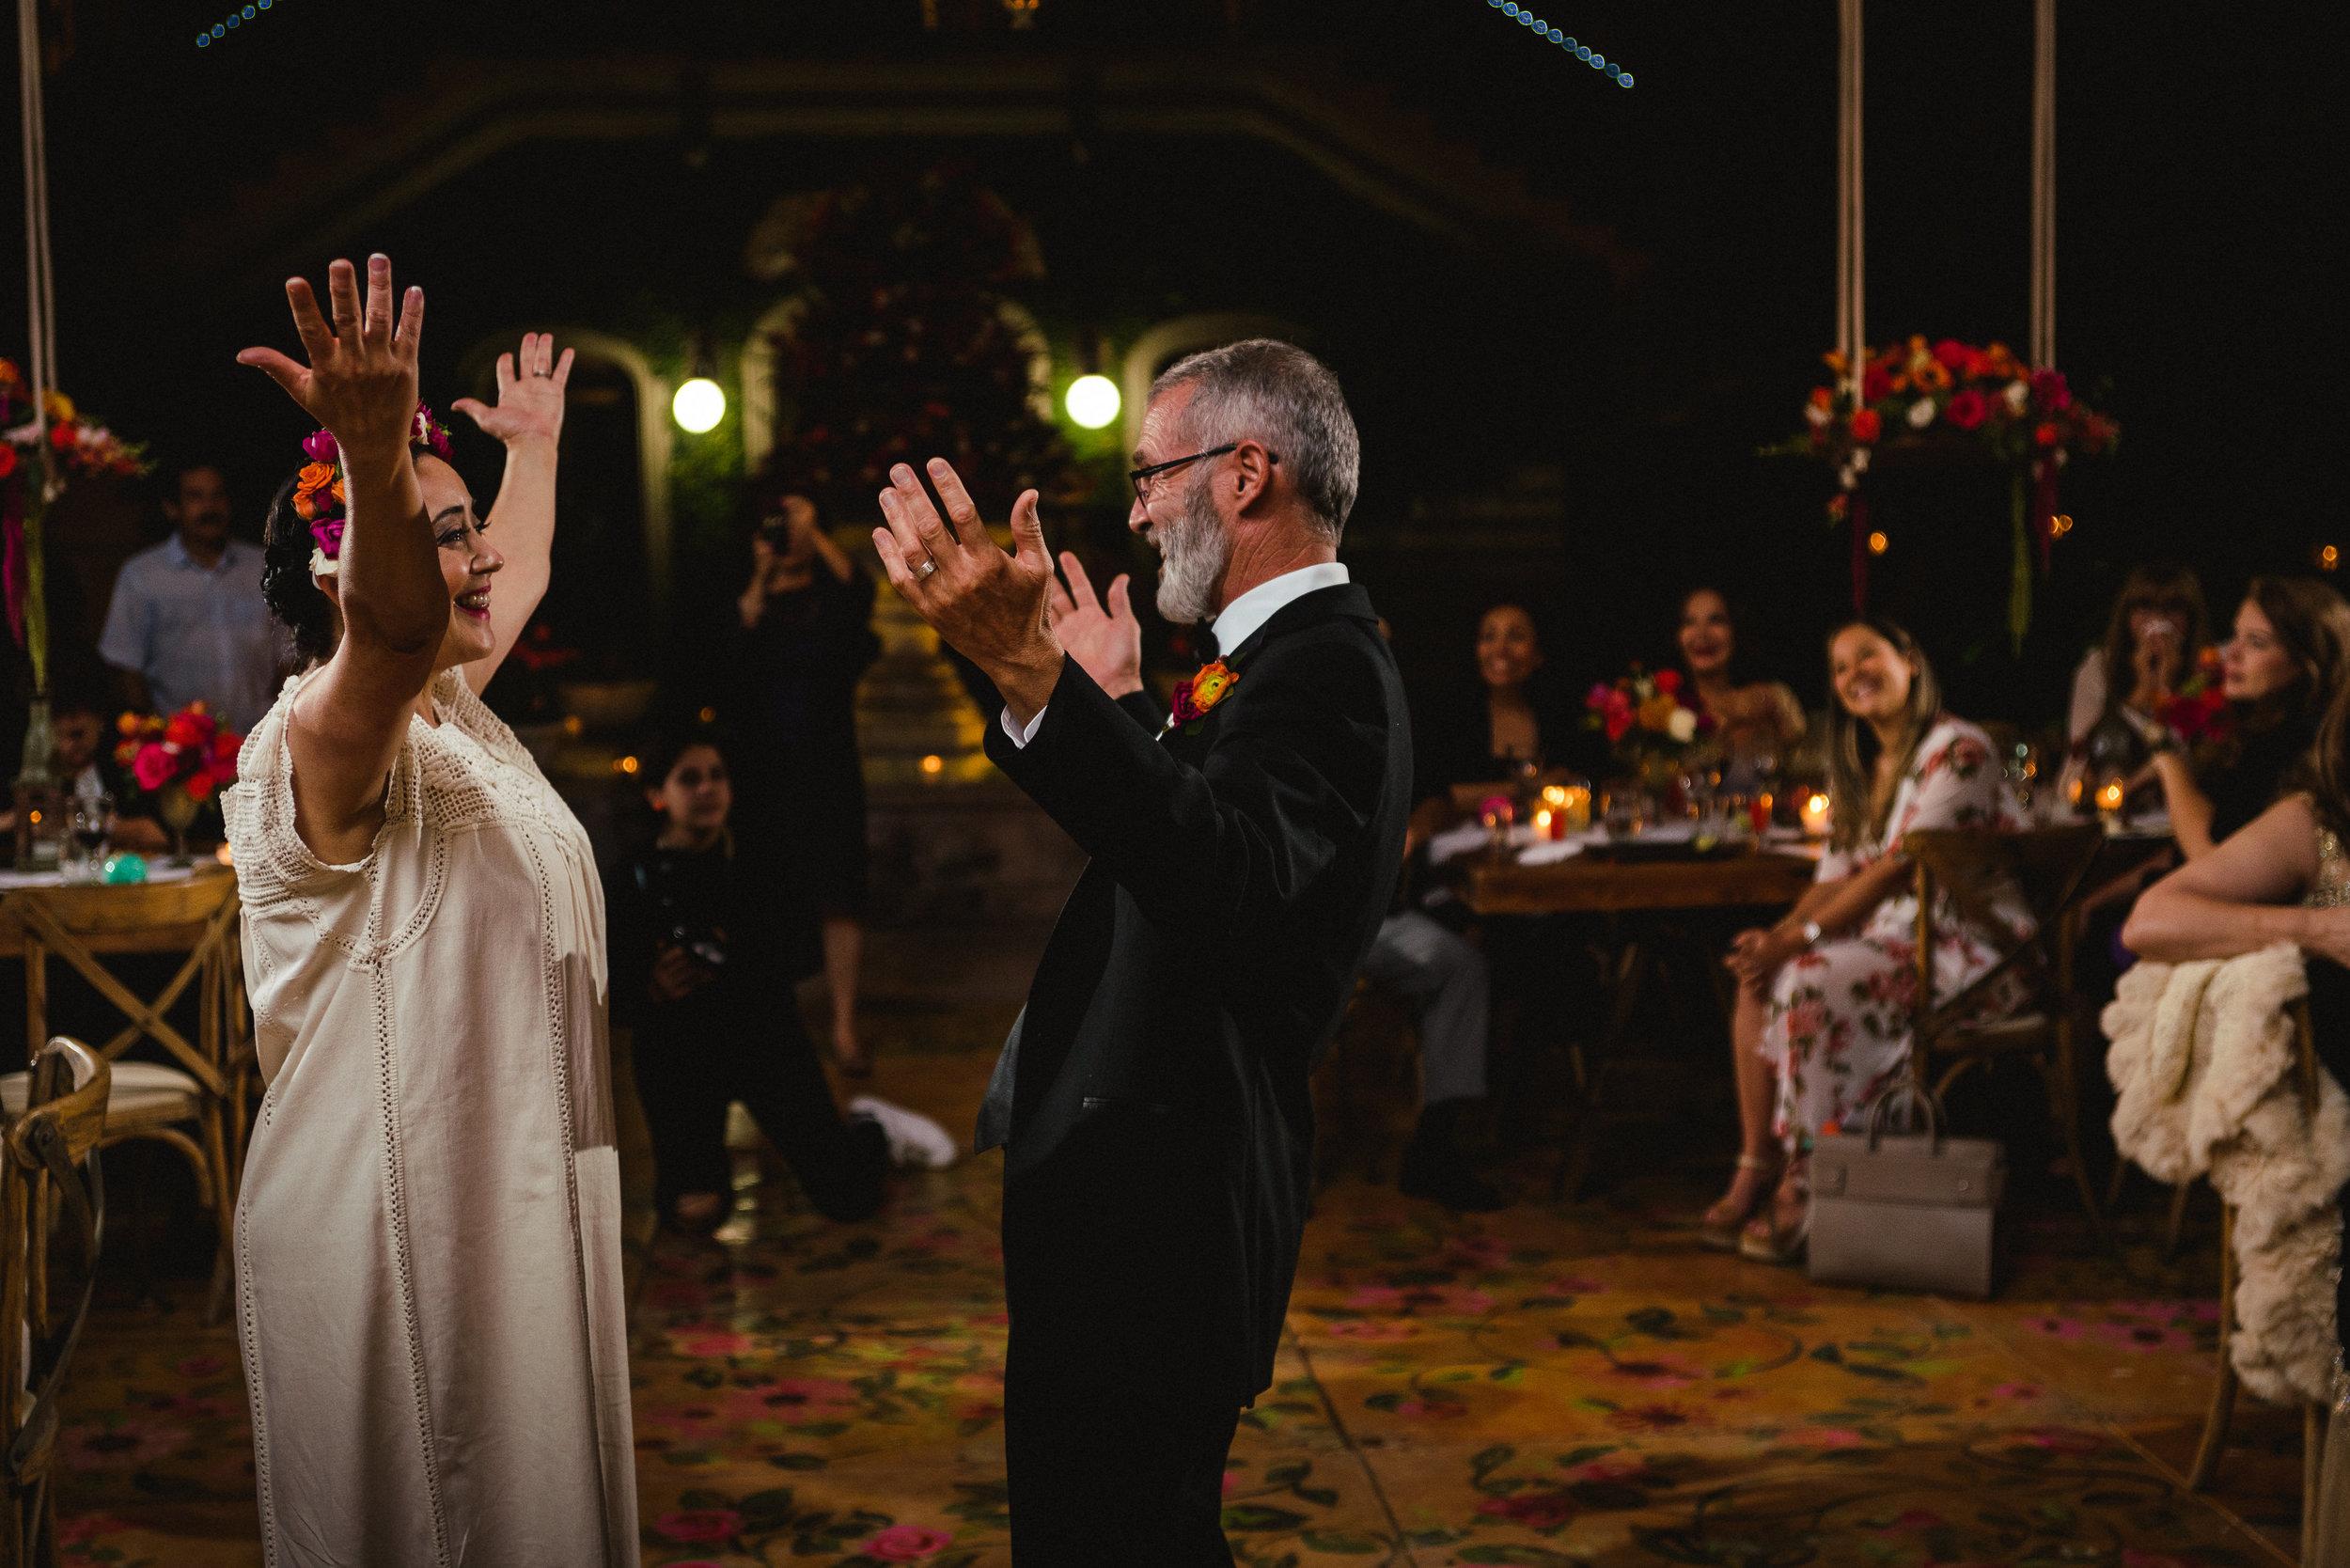 MaurizioSolisBroca-casa-carino-san-miguel-de-allende-wedding-86.jpg